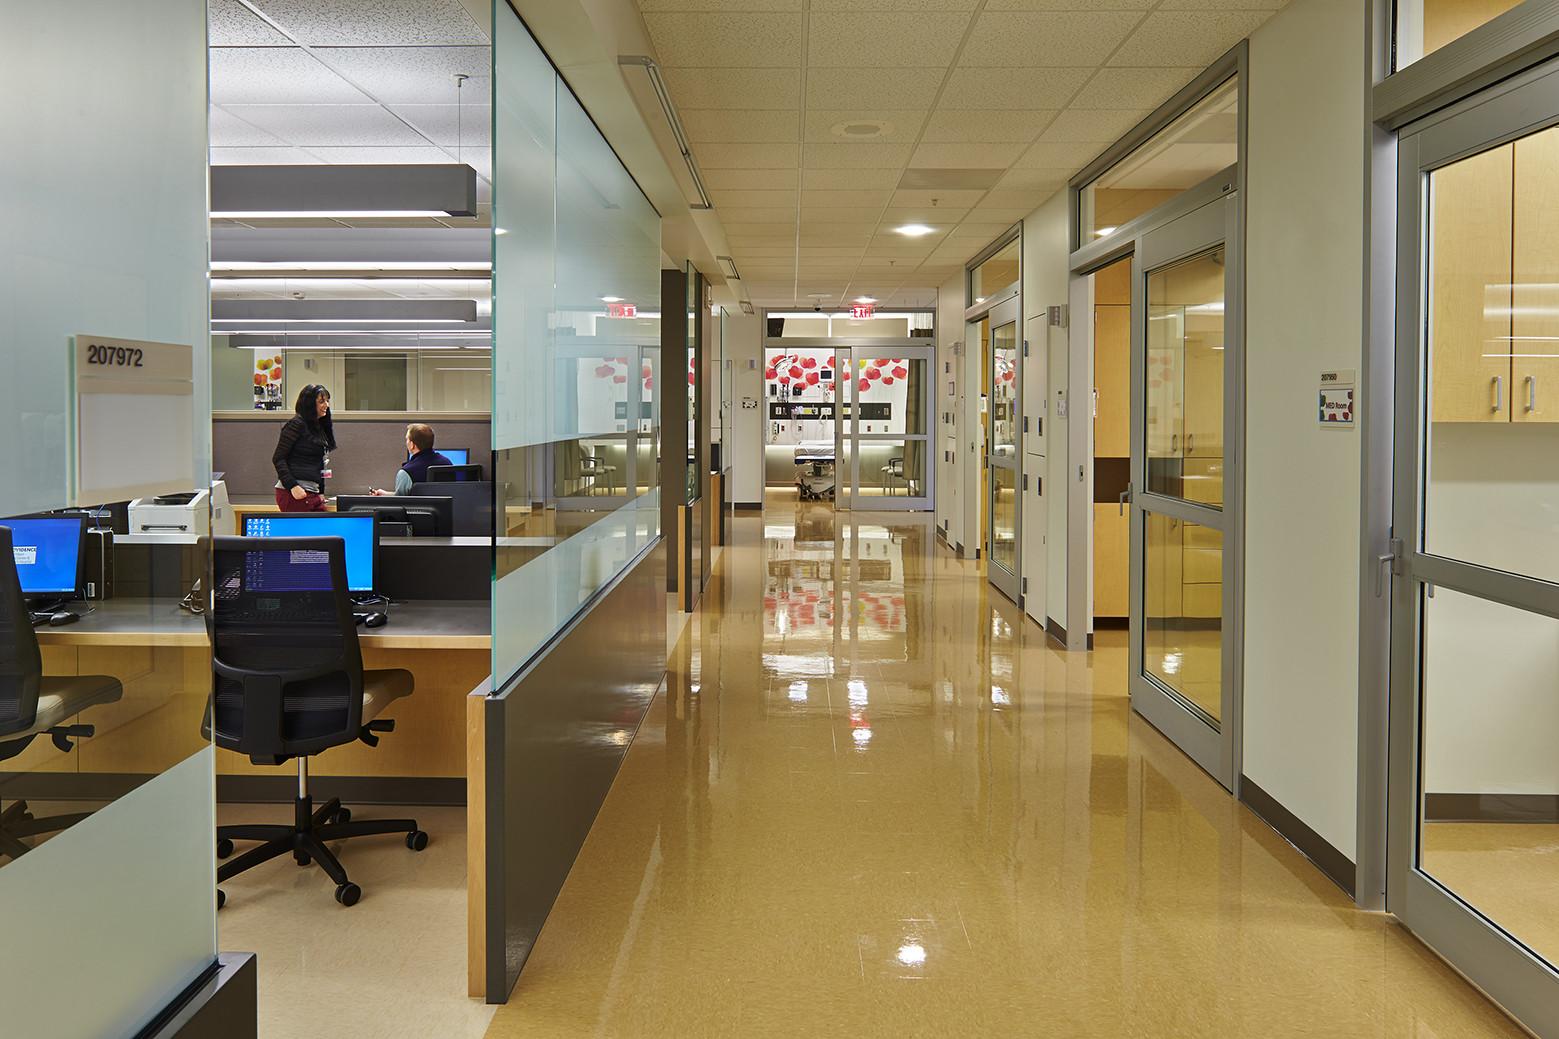 University Medical Center Pediatrics Emergency Room